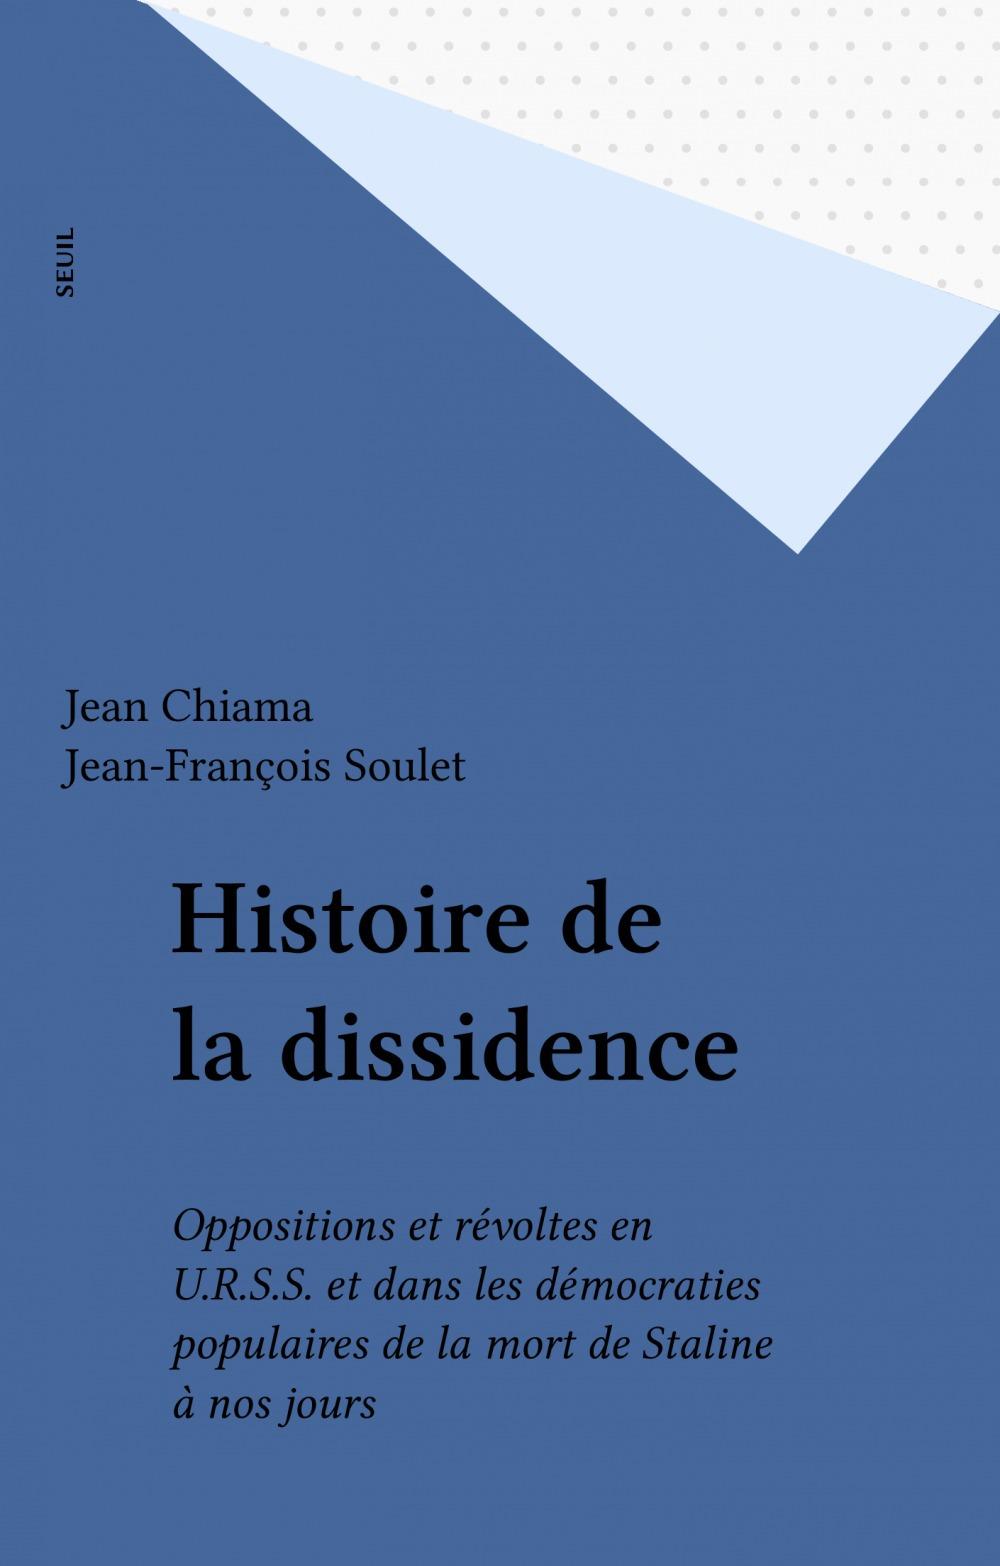 Histoire de la dissidence